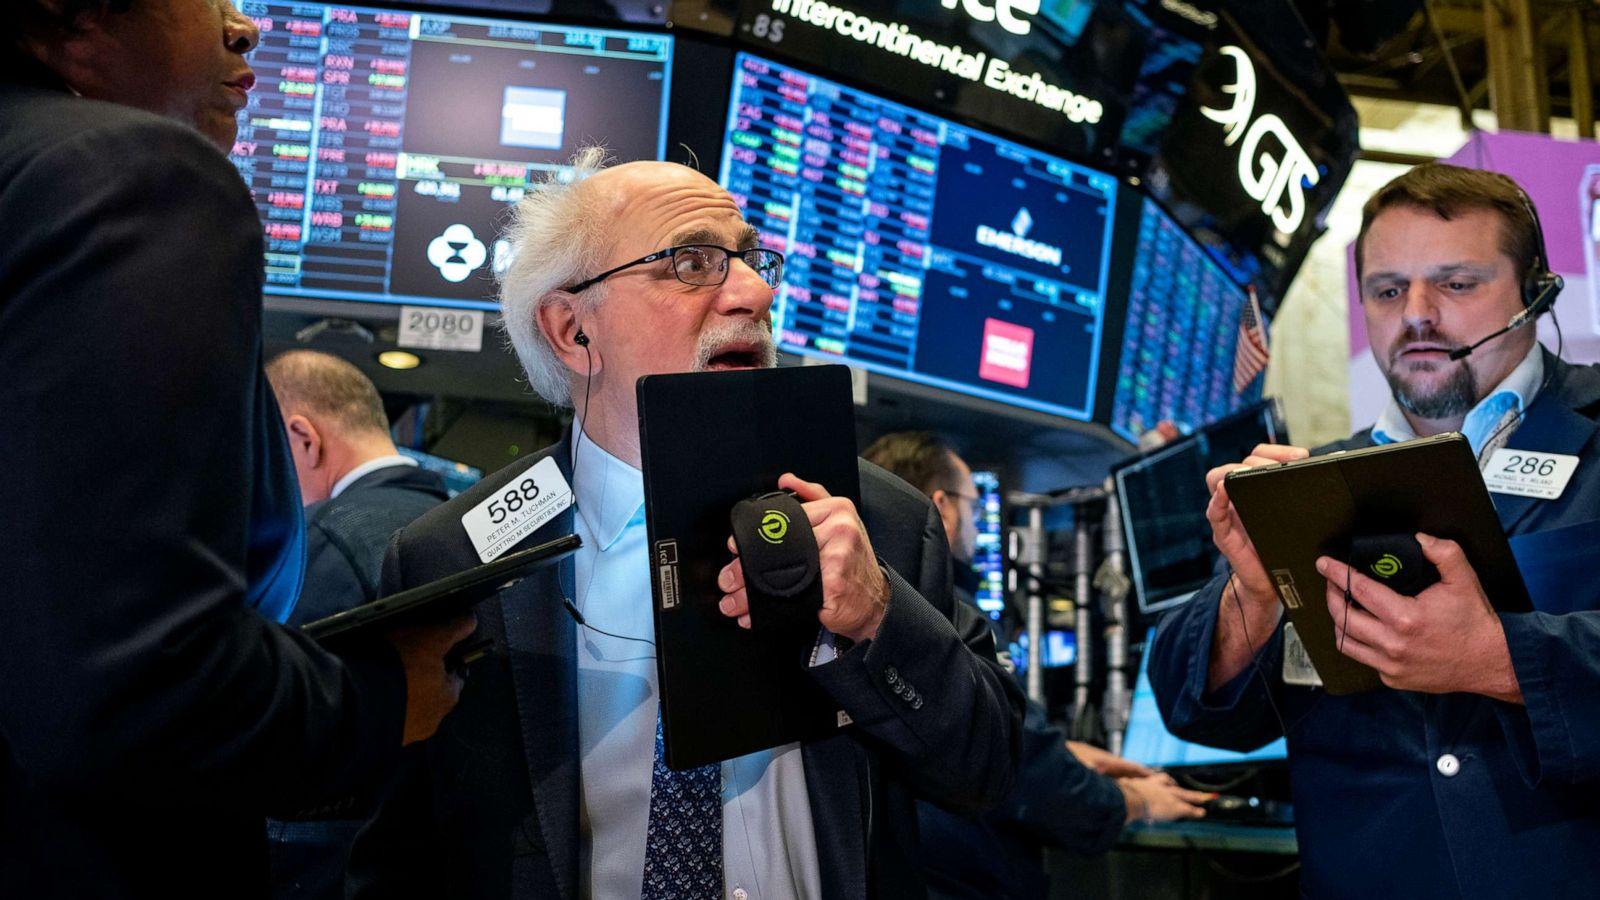 Dow Jones Plunges Most Since 2008 On Coronavirus Fears Abc News